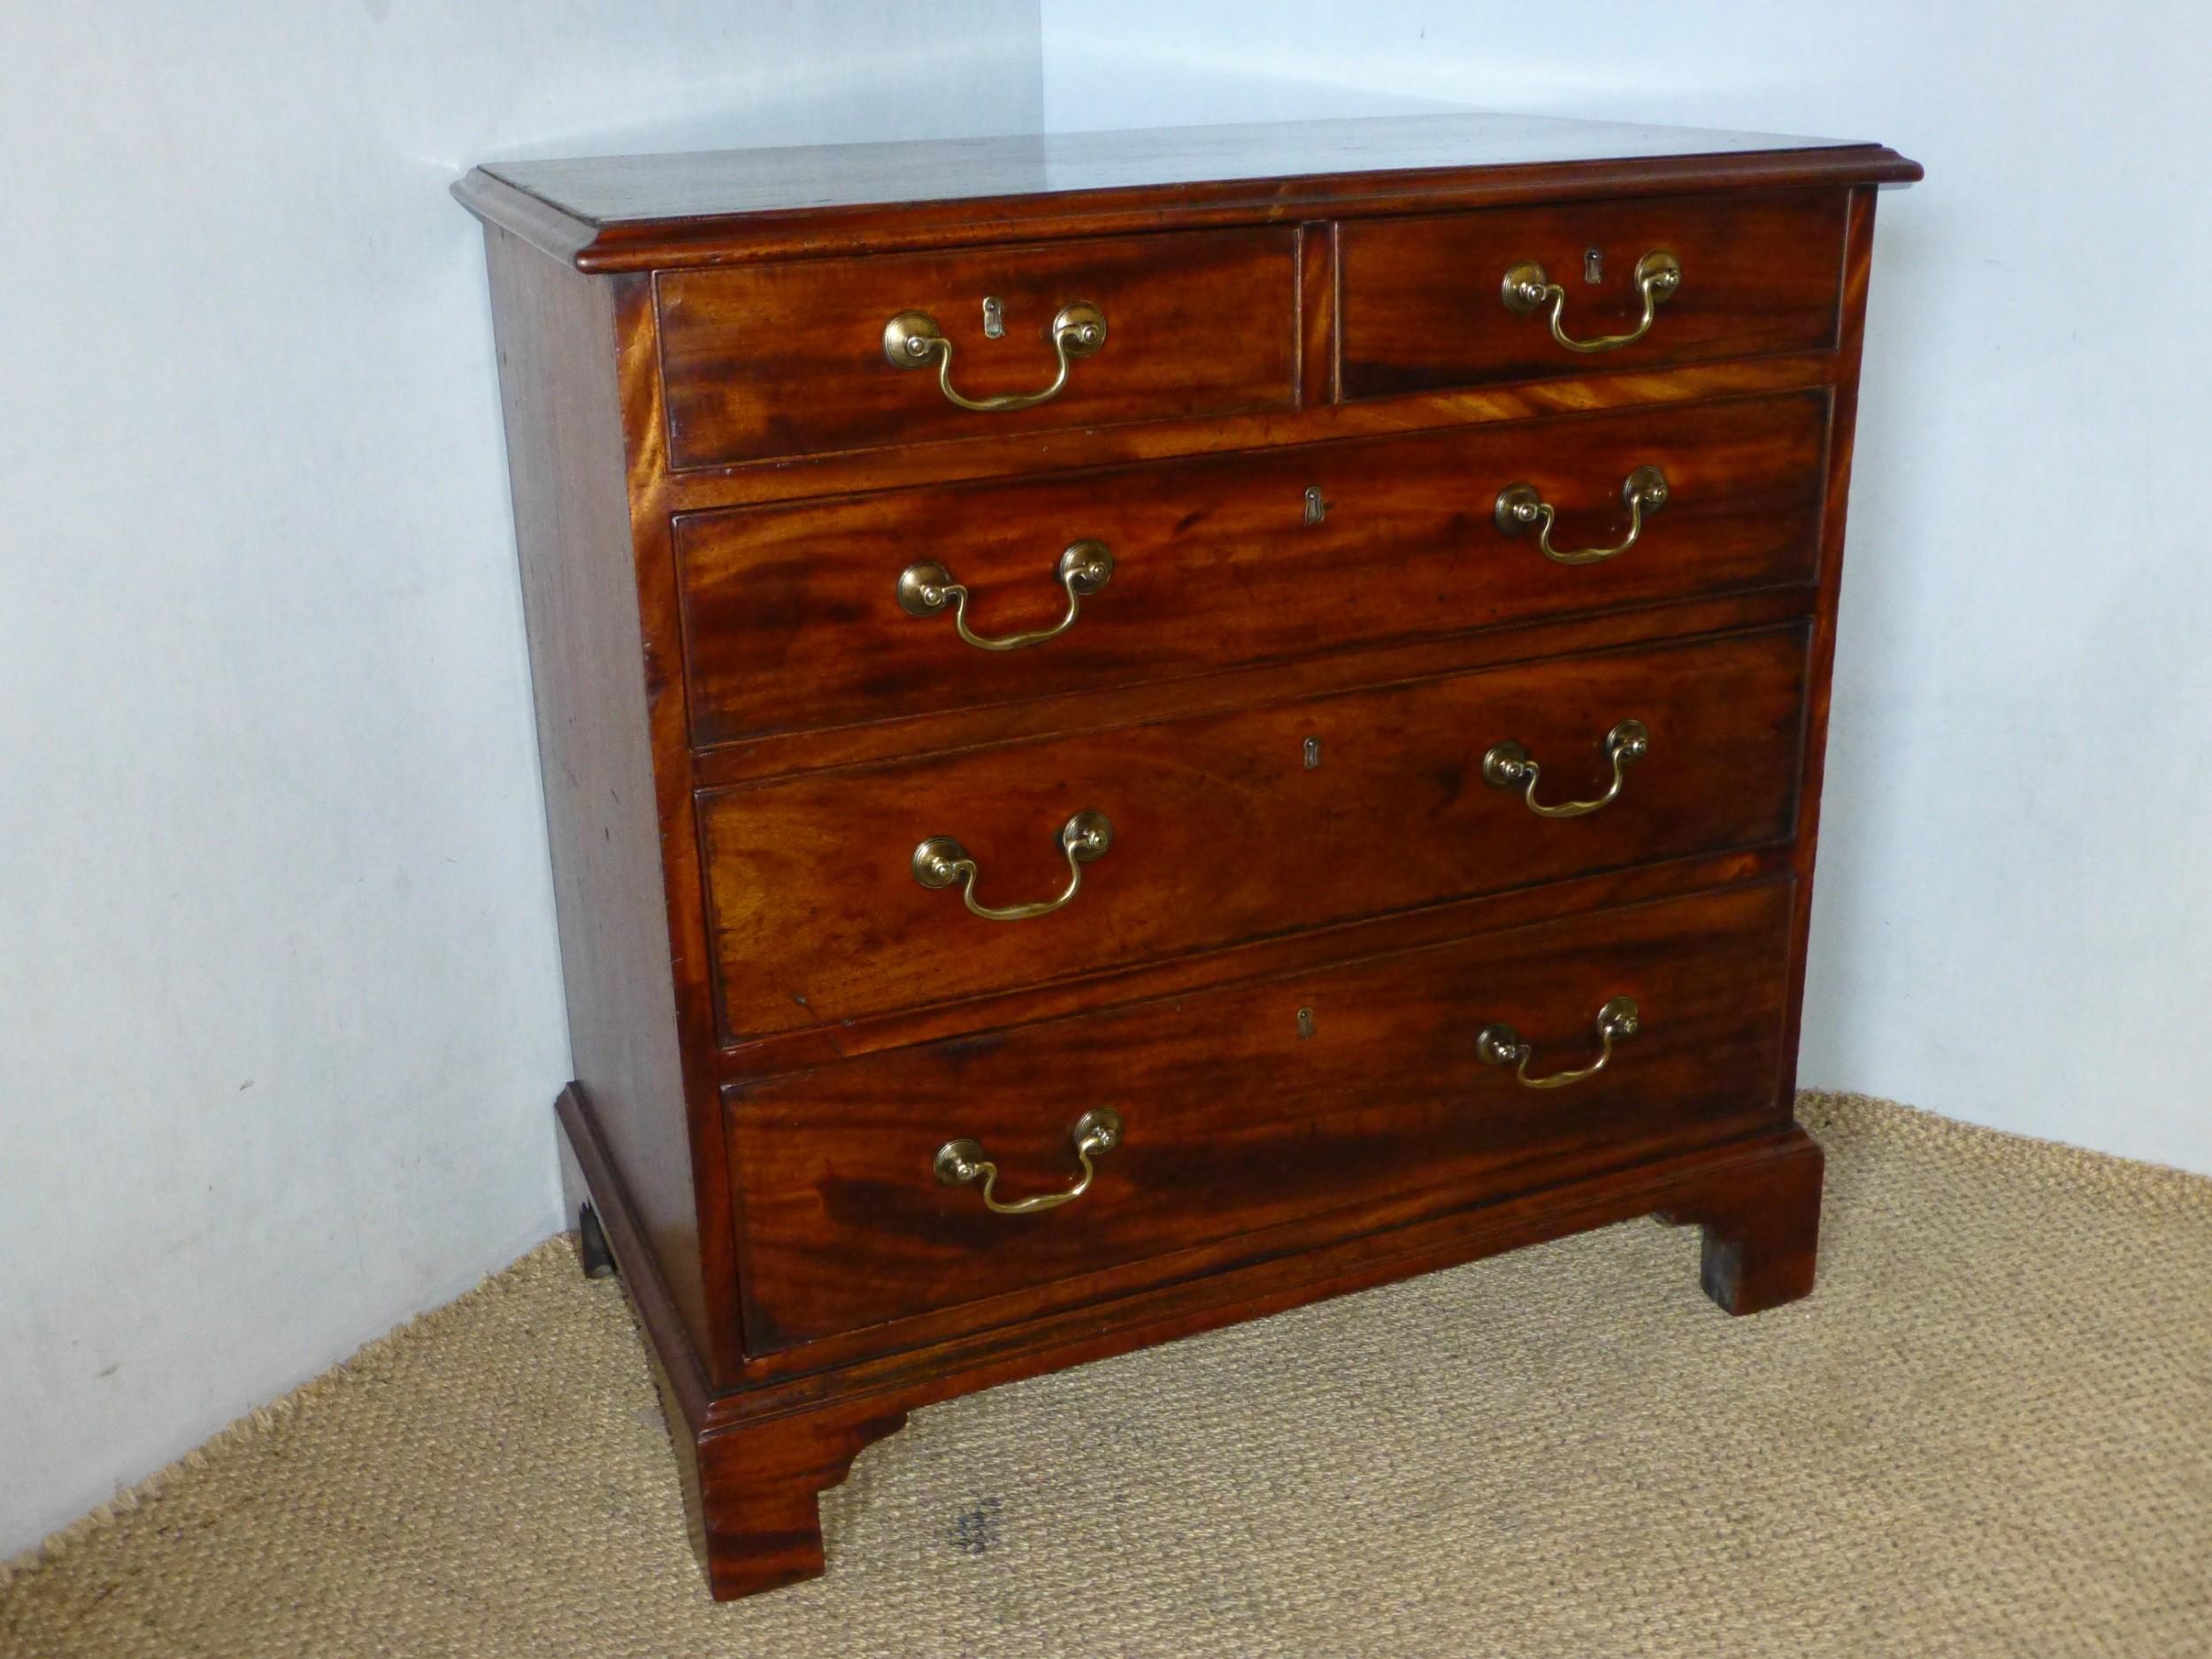 18th century georgian mahogany small 30 bachelors chest of drawers